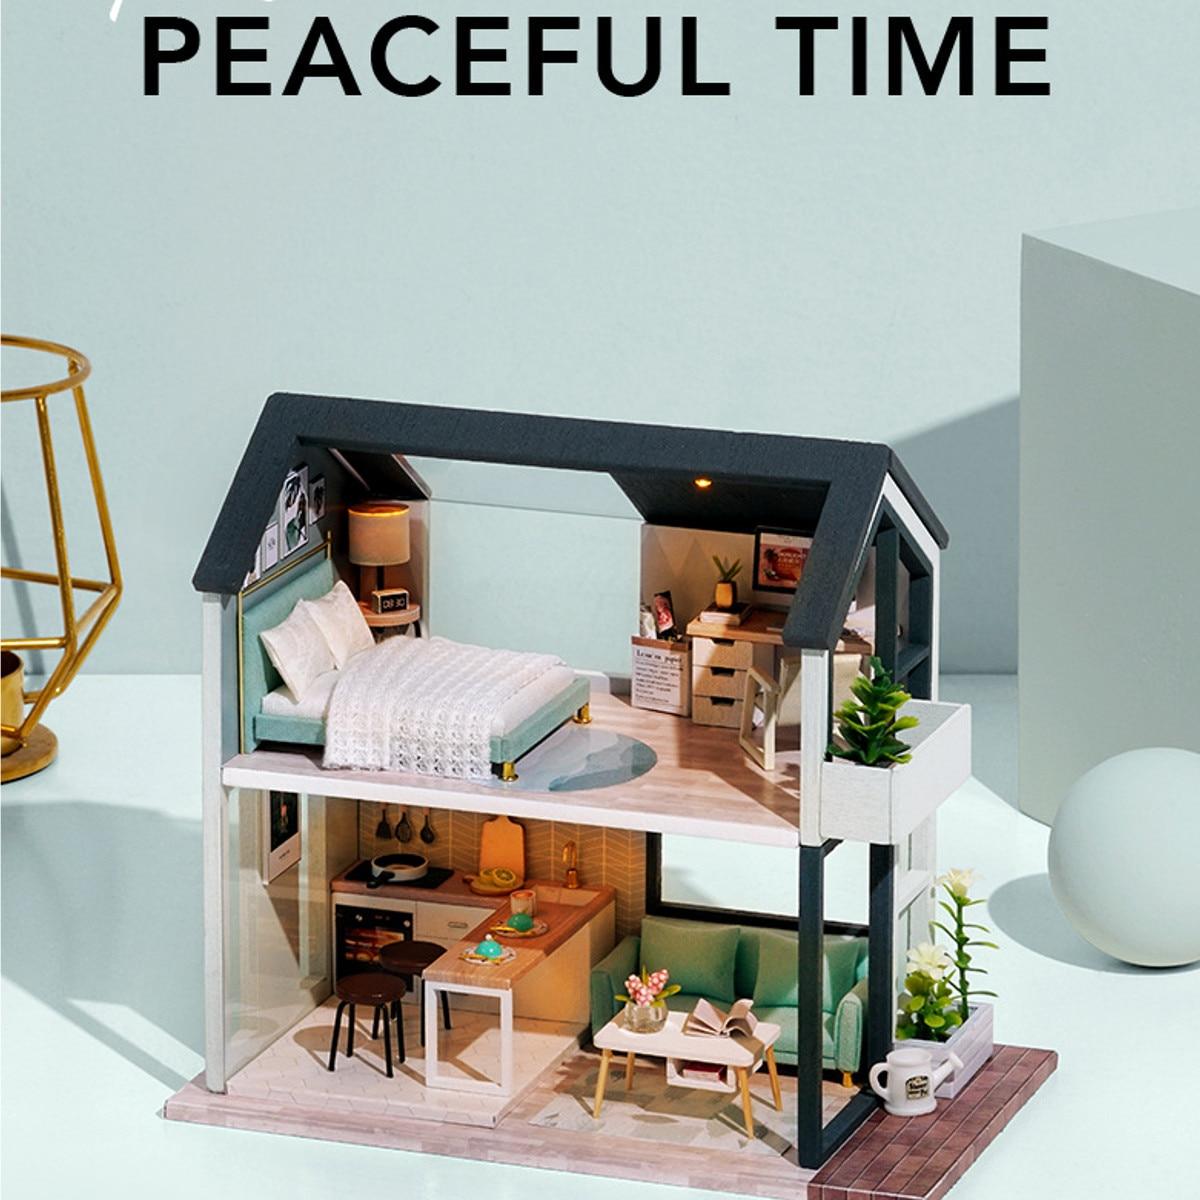 DIY Dollhouse Handmade 3D Miniature Nordic  LED Light Assembly Making Cute Model Furniture Kit DIY Adult Kids Gift